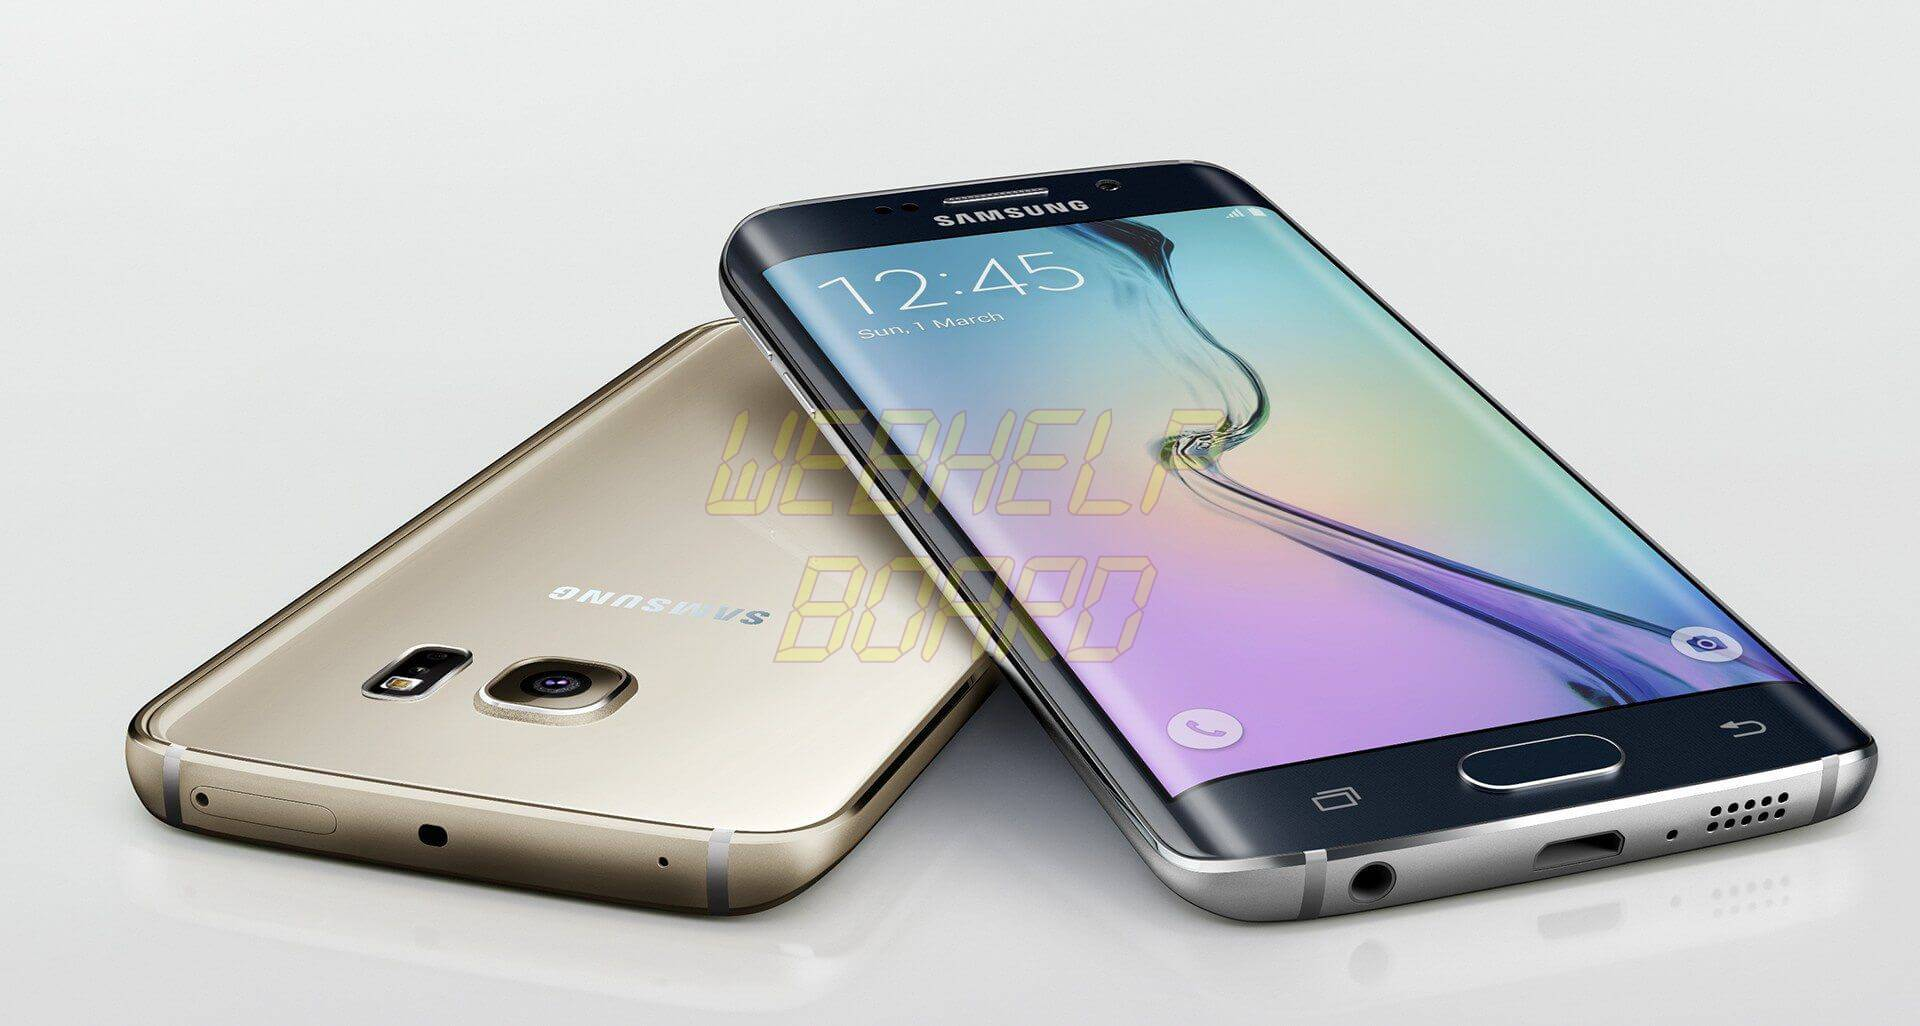 samsung kills galaxy s7 edge plus following fans backlash 500024 2 - Tutorial: Configurando o sensor de impressão digital no Galaxy S7